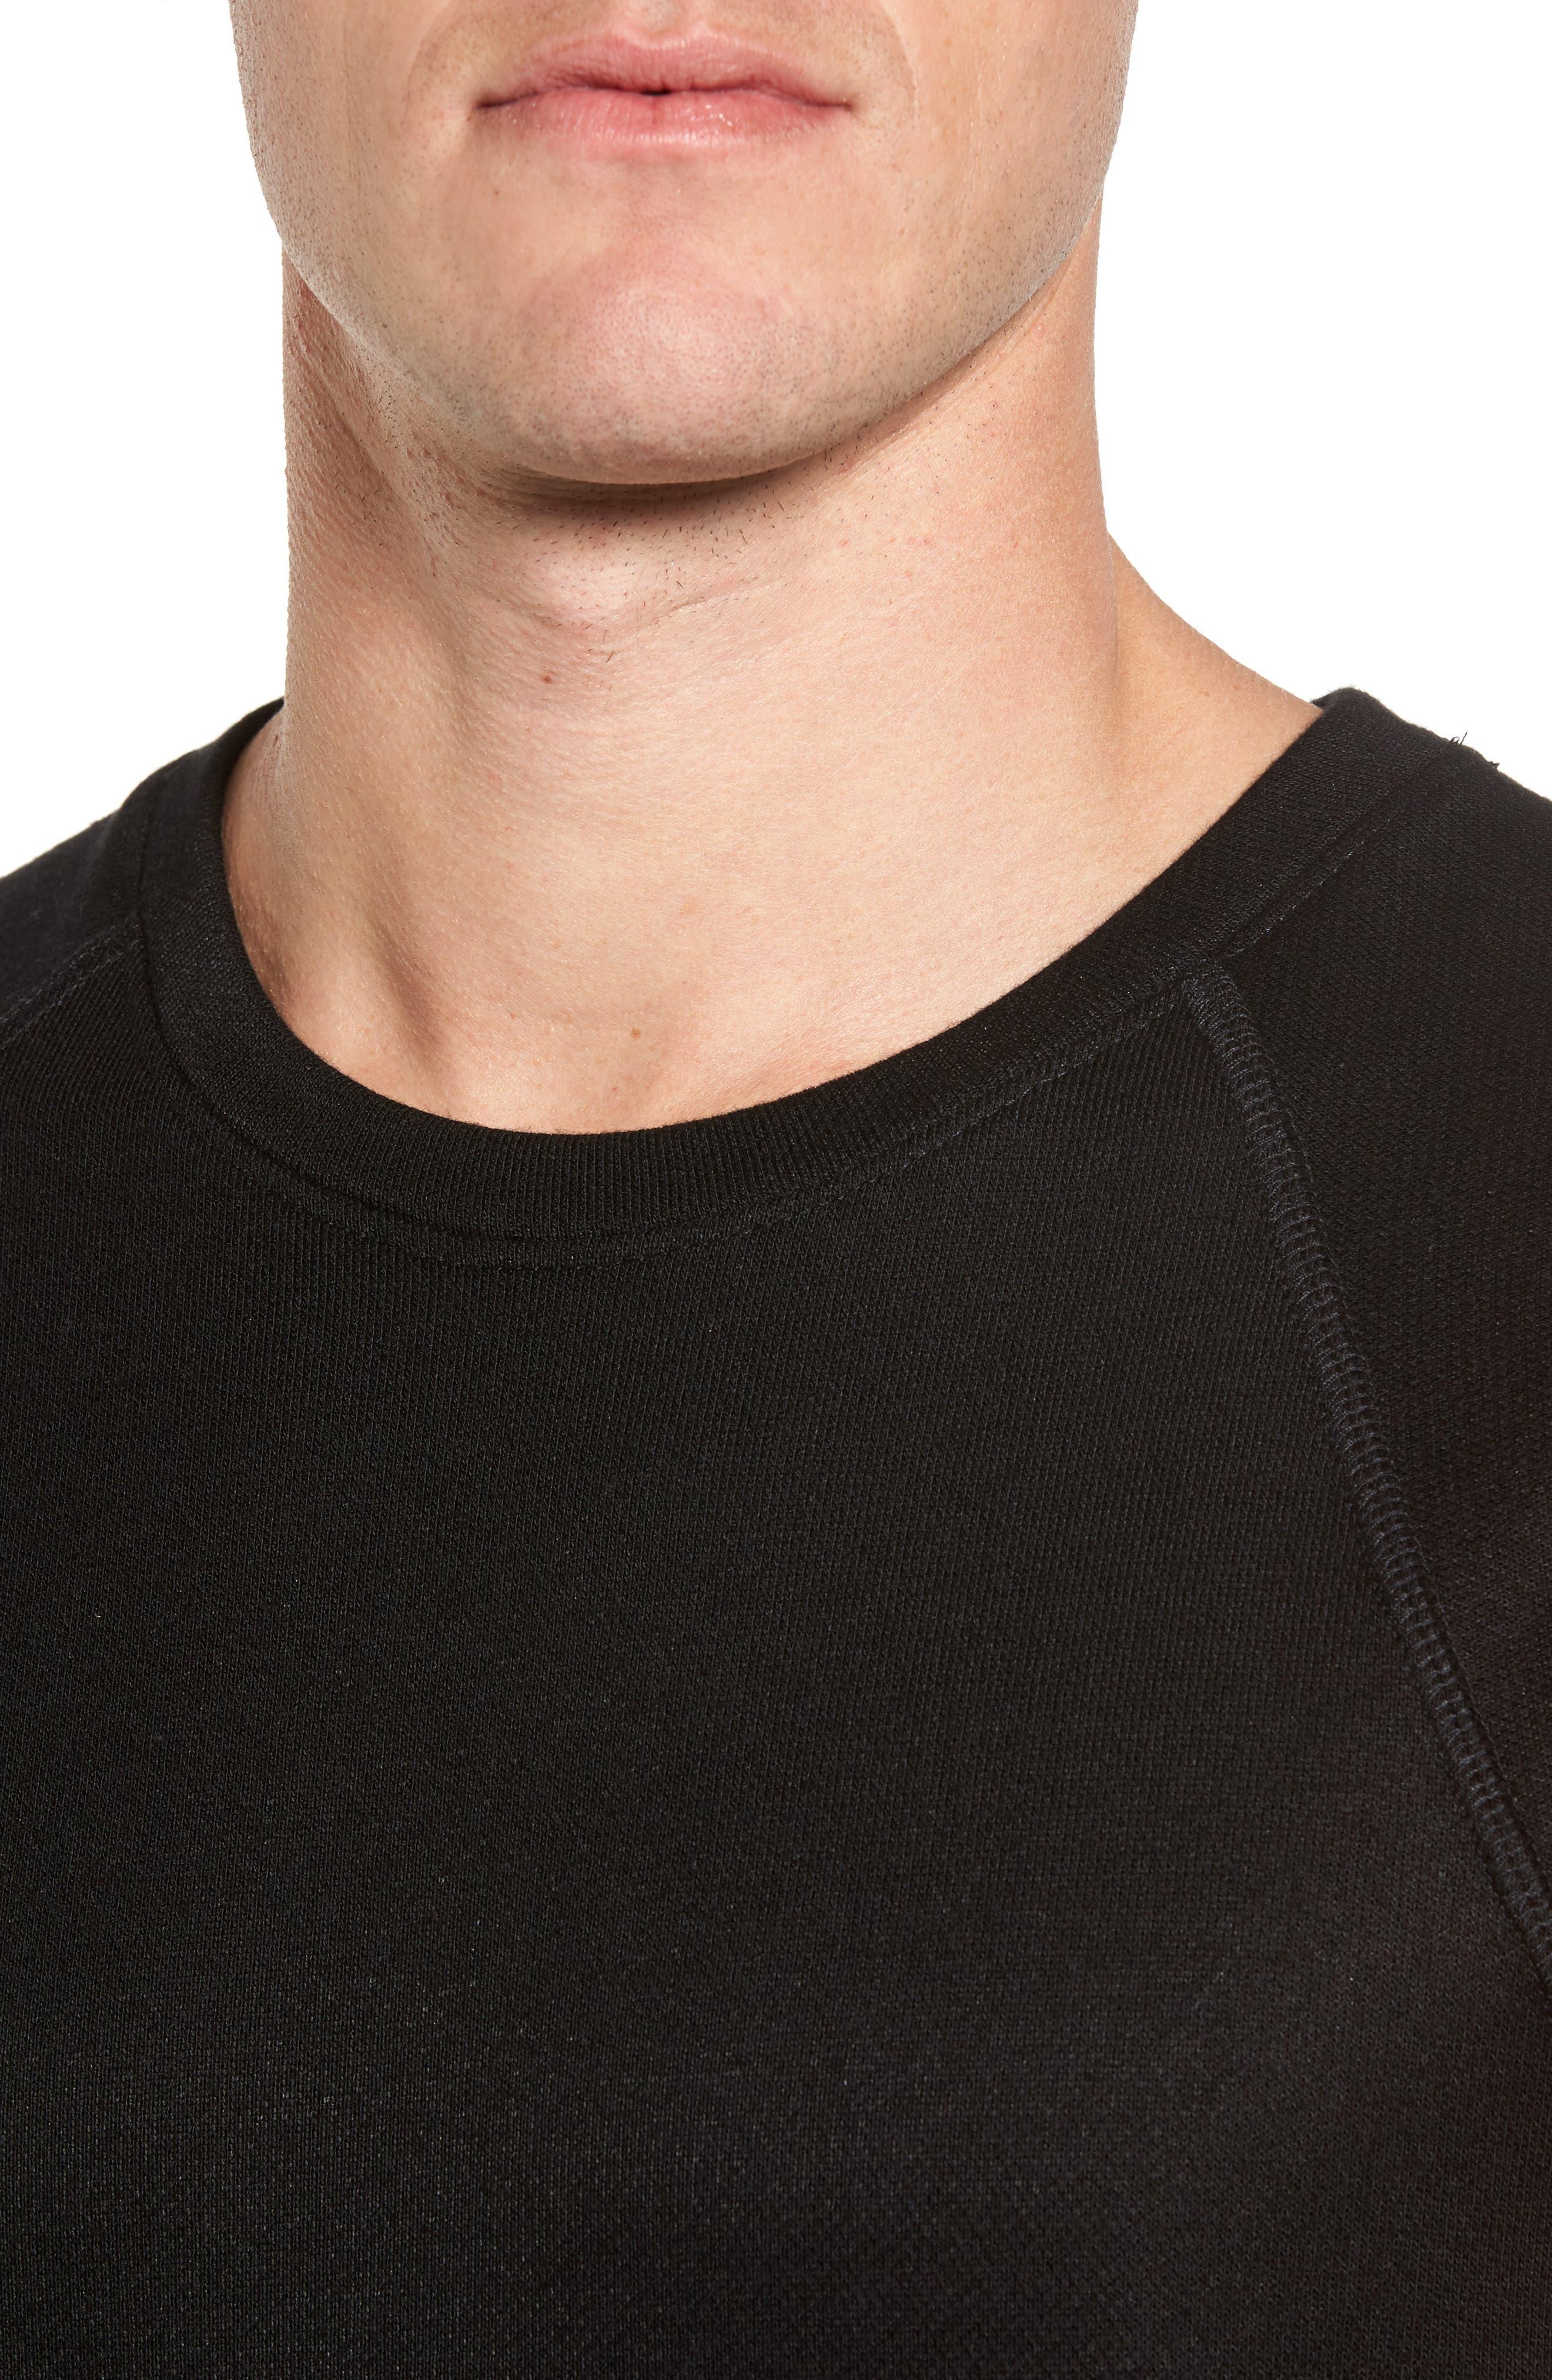 Dosha Relaxed Fit Sweatshirt Tank,                             Alternate thumbnail 4, color,                             BLACK